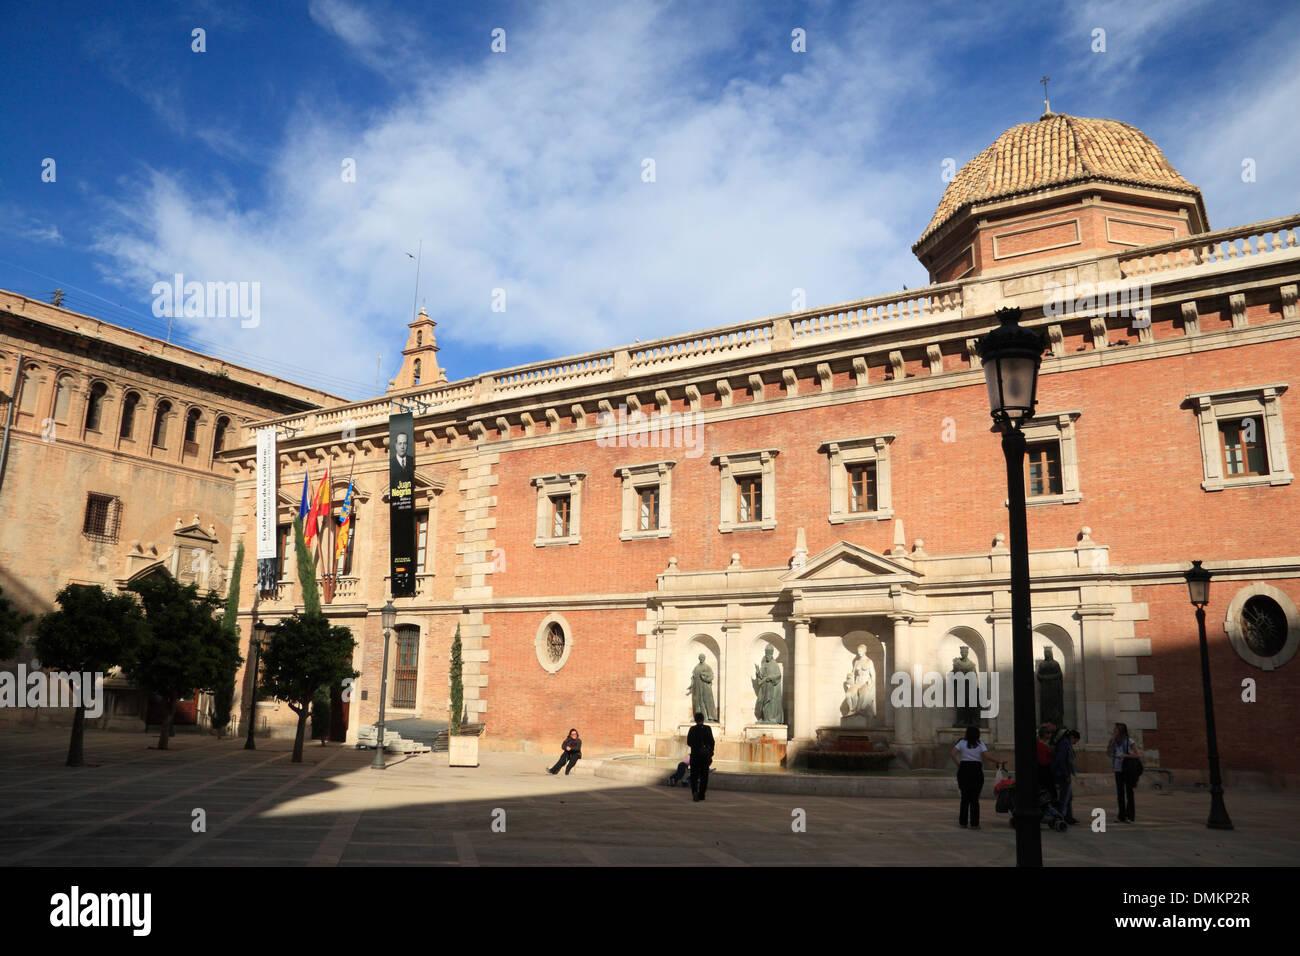 Universidad Literaria, Valencia, Spain, Europe - Stock Image